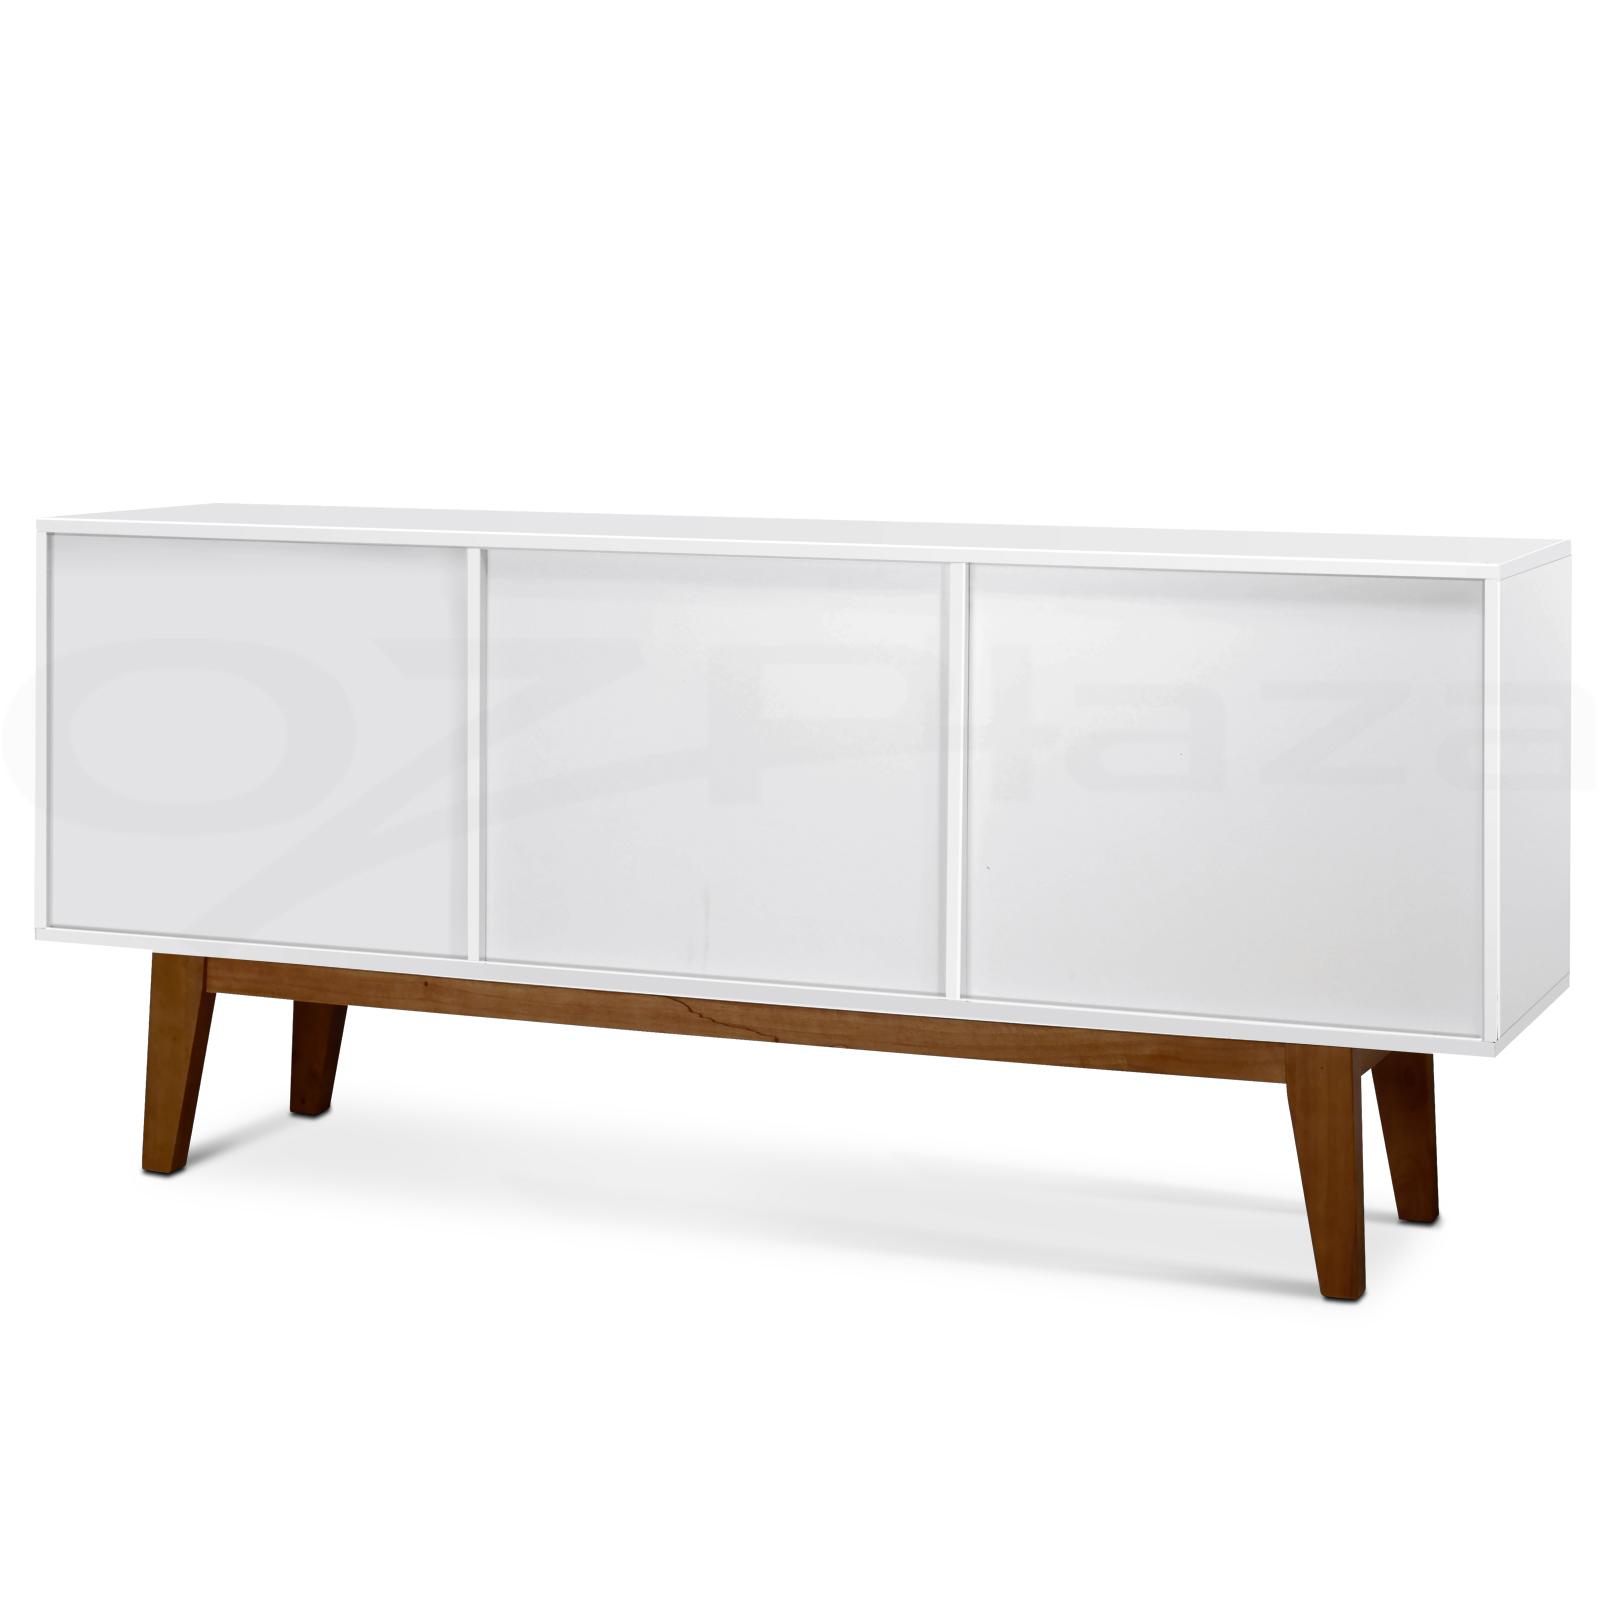 White Buffet Table : buffet sideboard scandinavian retro table cabinet cupboard matt white ...